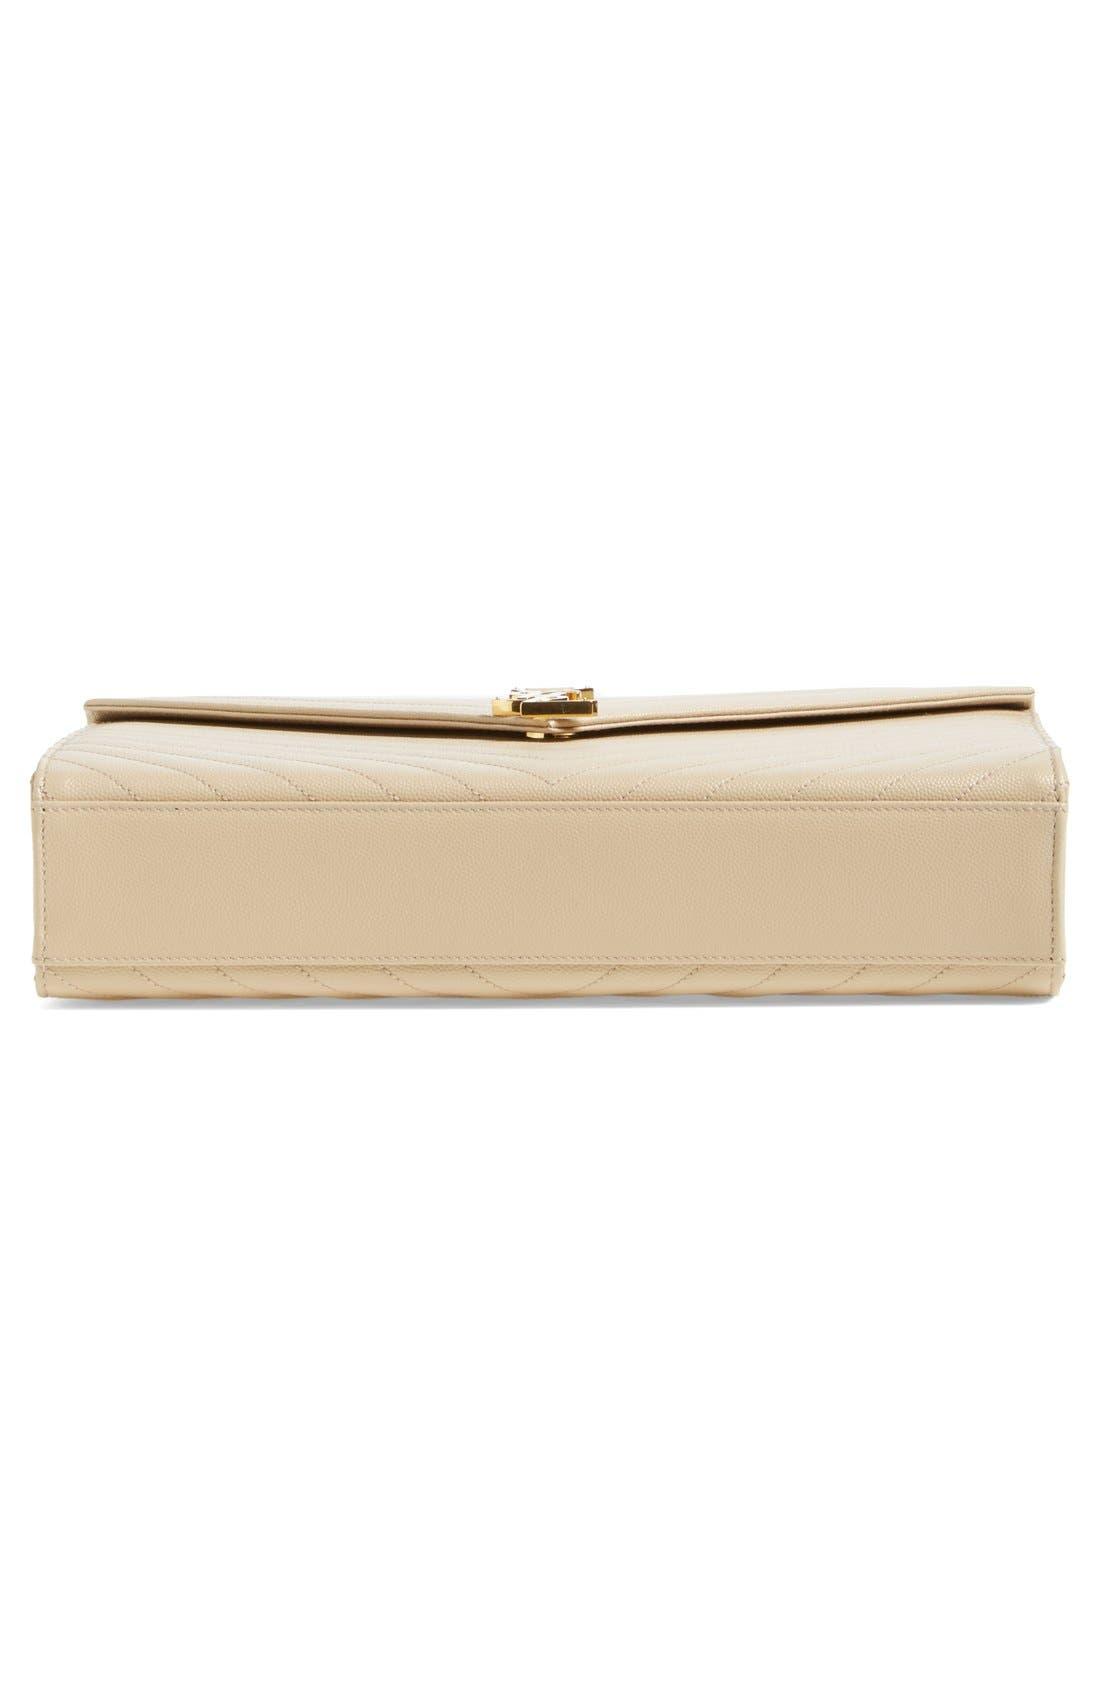 ,                             'Large Monogram' Grained Leather Shoulder Bag,                             Alternate thumbnail 6, color,                             251